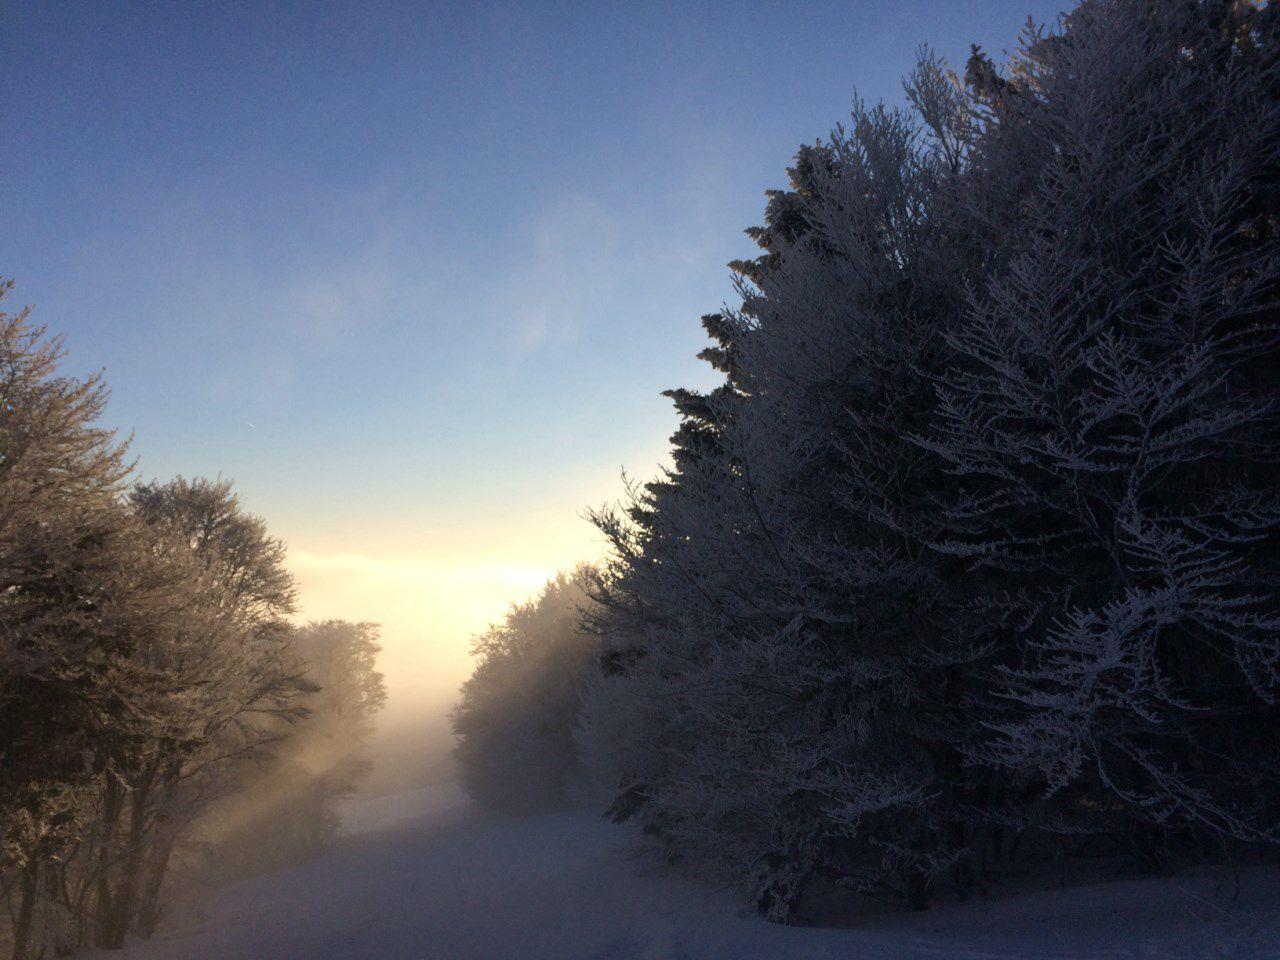 2017: Mercredi à la neige